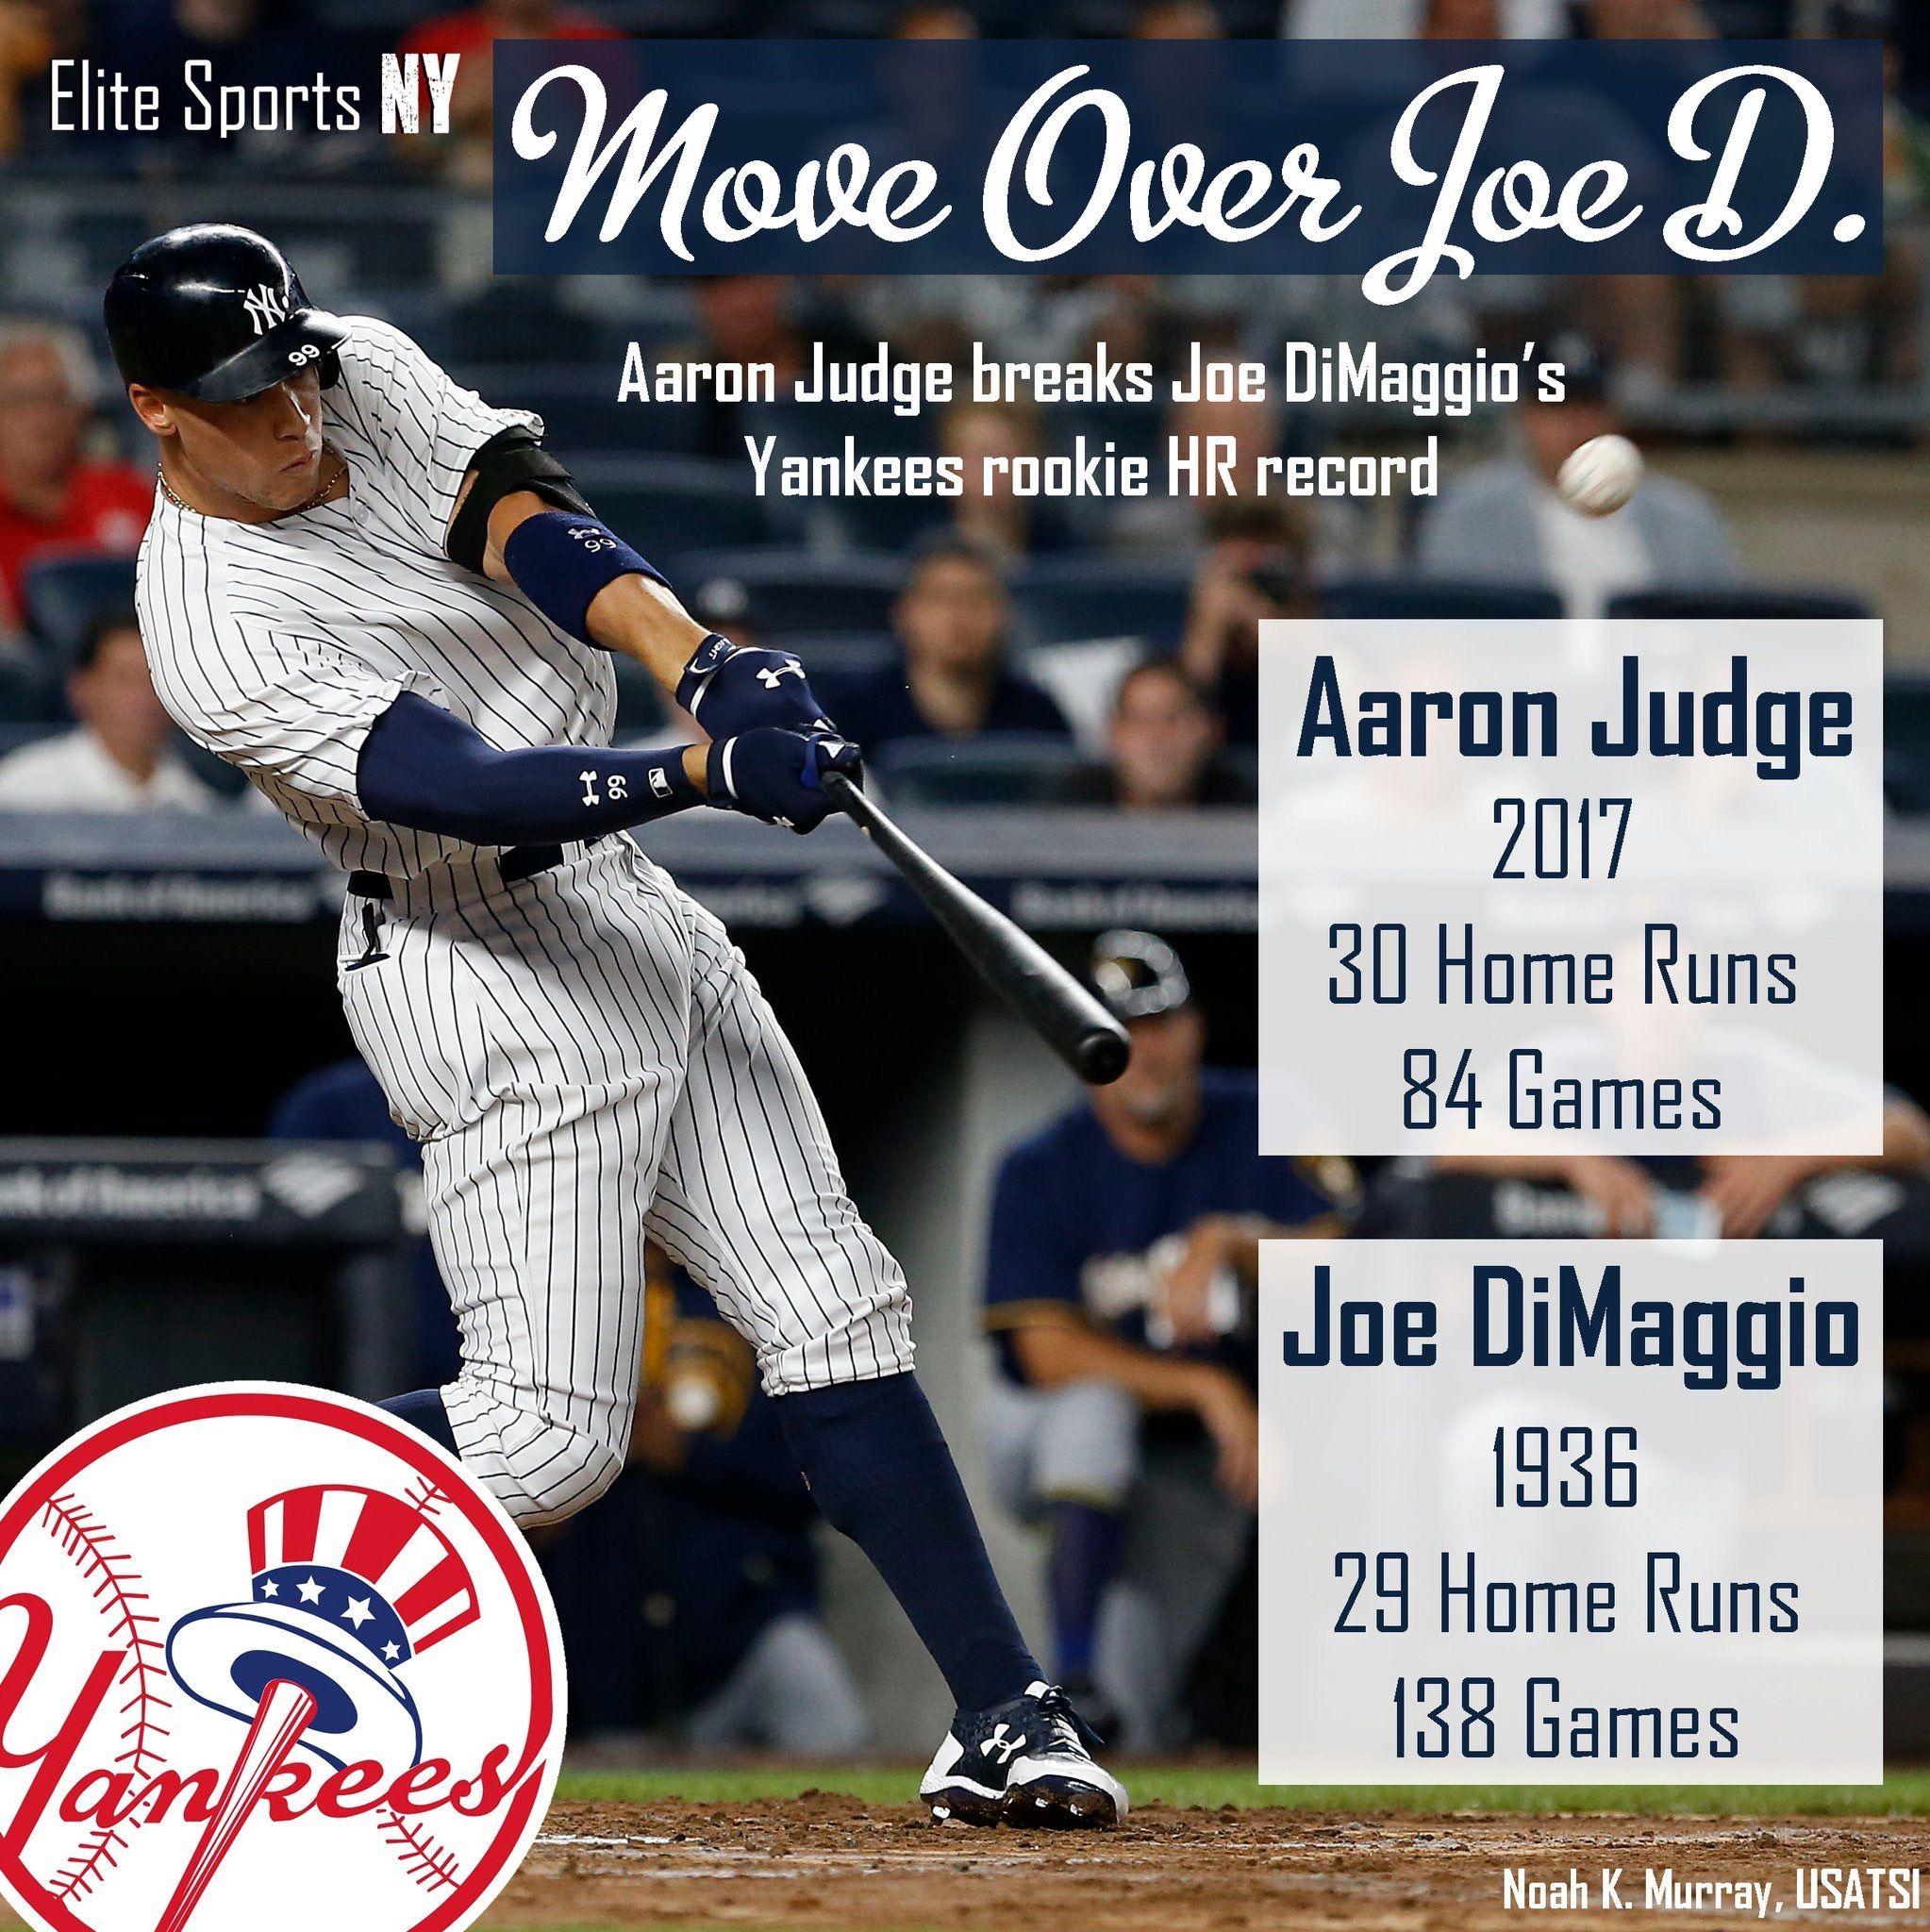 Aaron Judge Breaks Joe D's Rookie Yankee Home Run Record